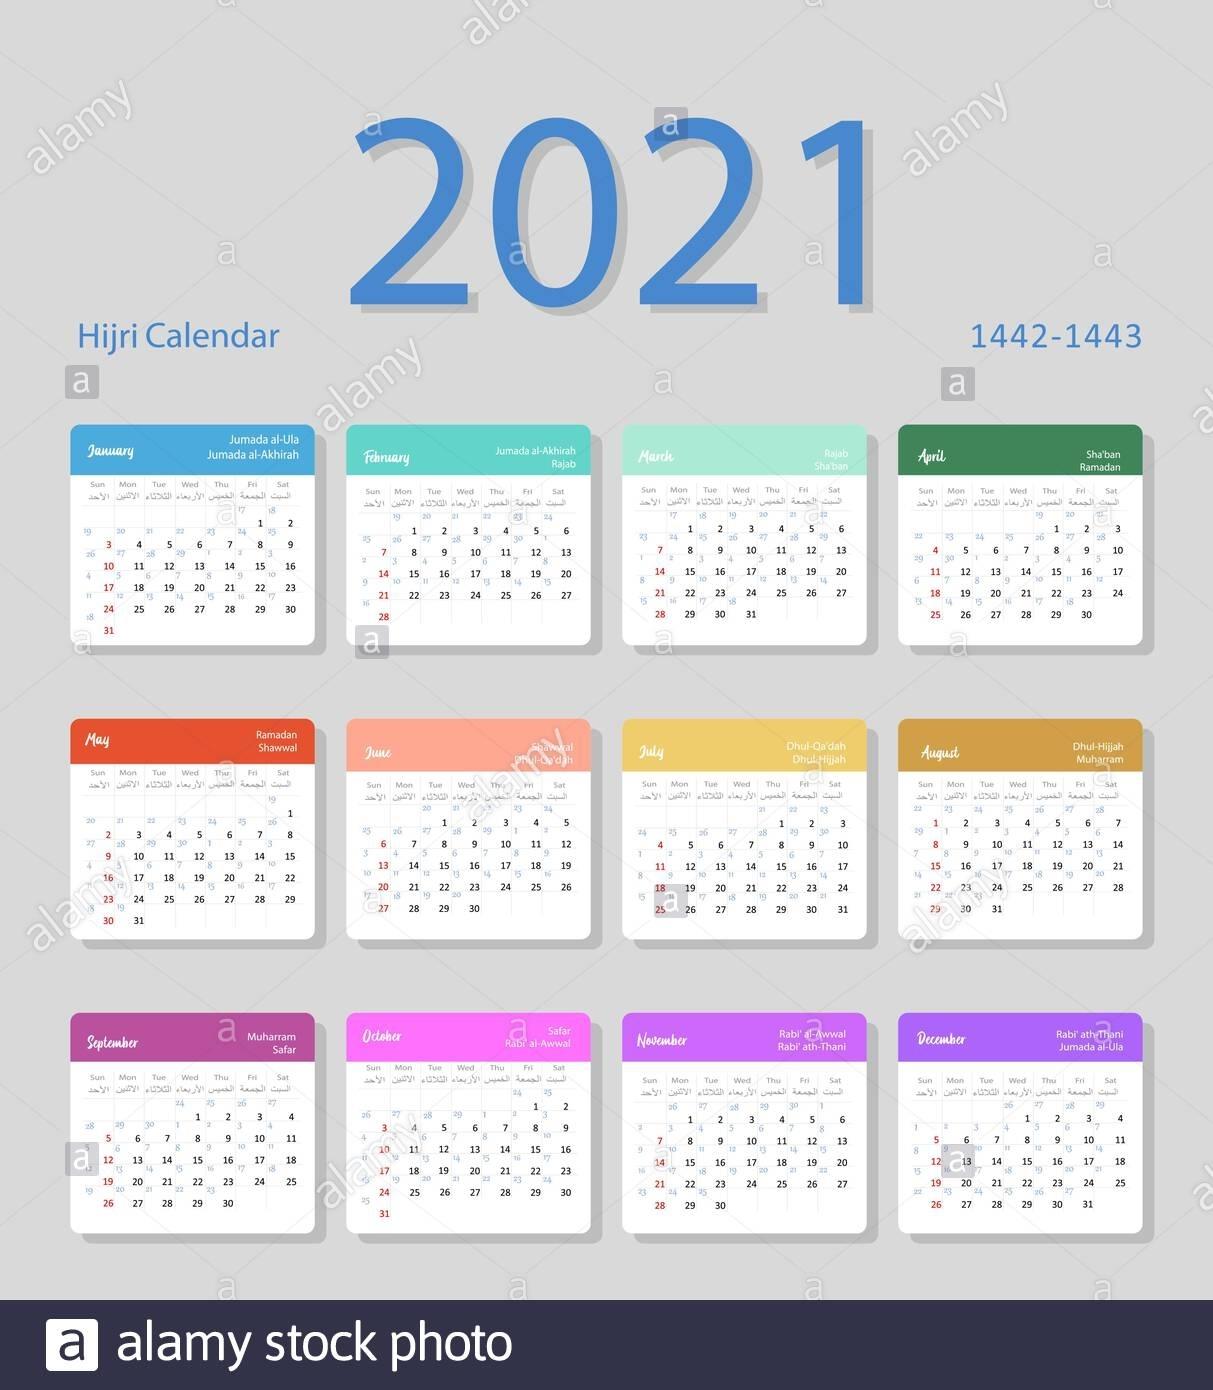 Page 2 - Islamic Calendar High Resolution Stock Photography